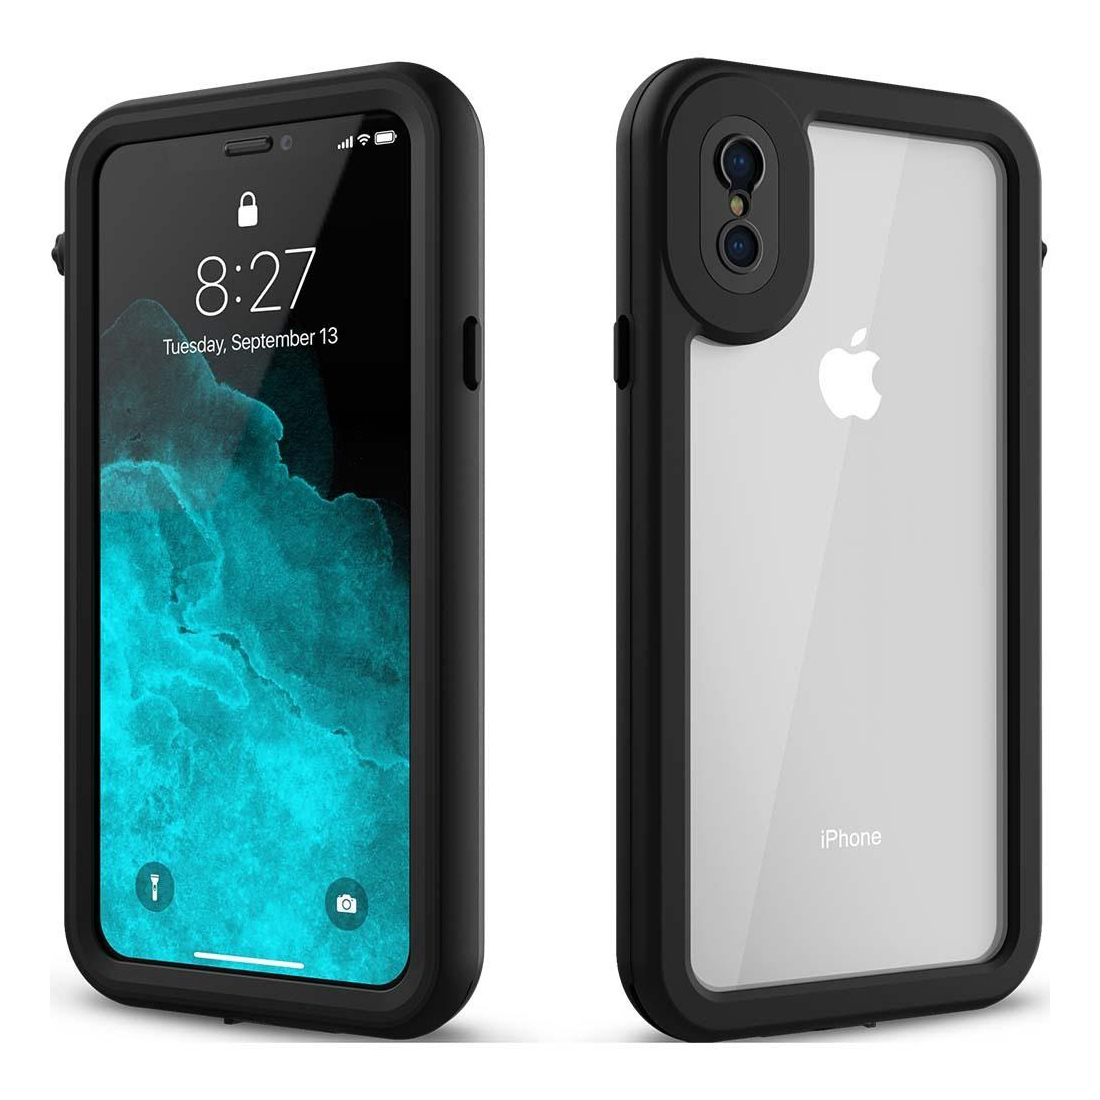 Hitcase Splash Αδιάβροχη Ανθεκτική Θήκη iPhone XS Max - Black (HC81400)